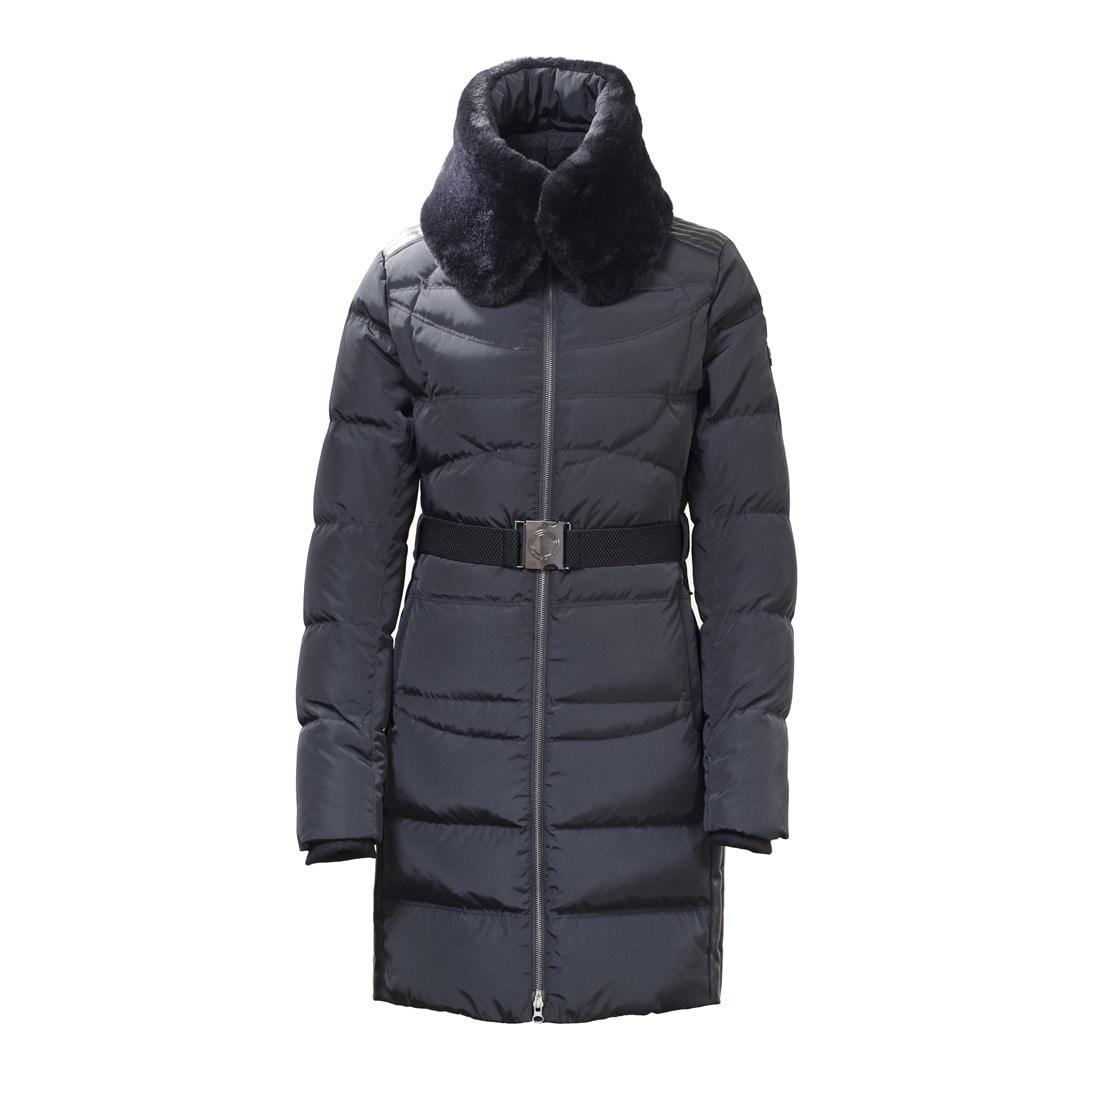 c46820ac8 Blue Down Coat - Jy Coat